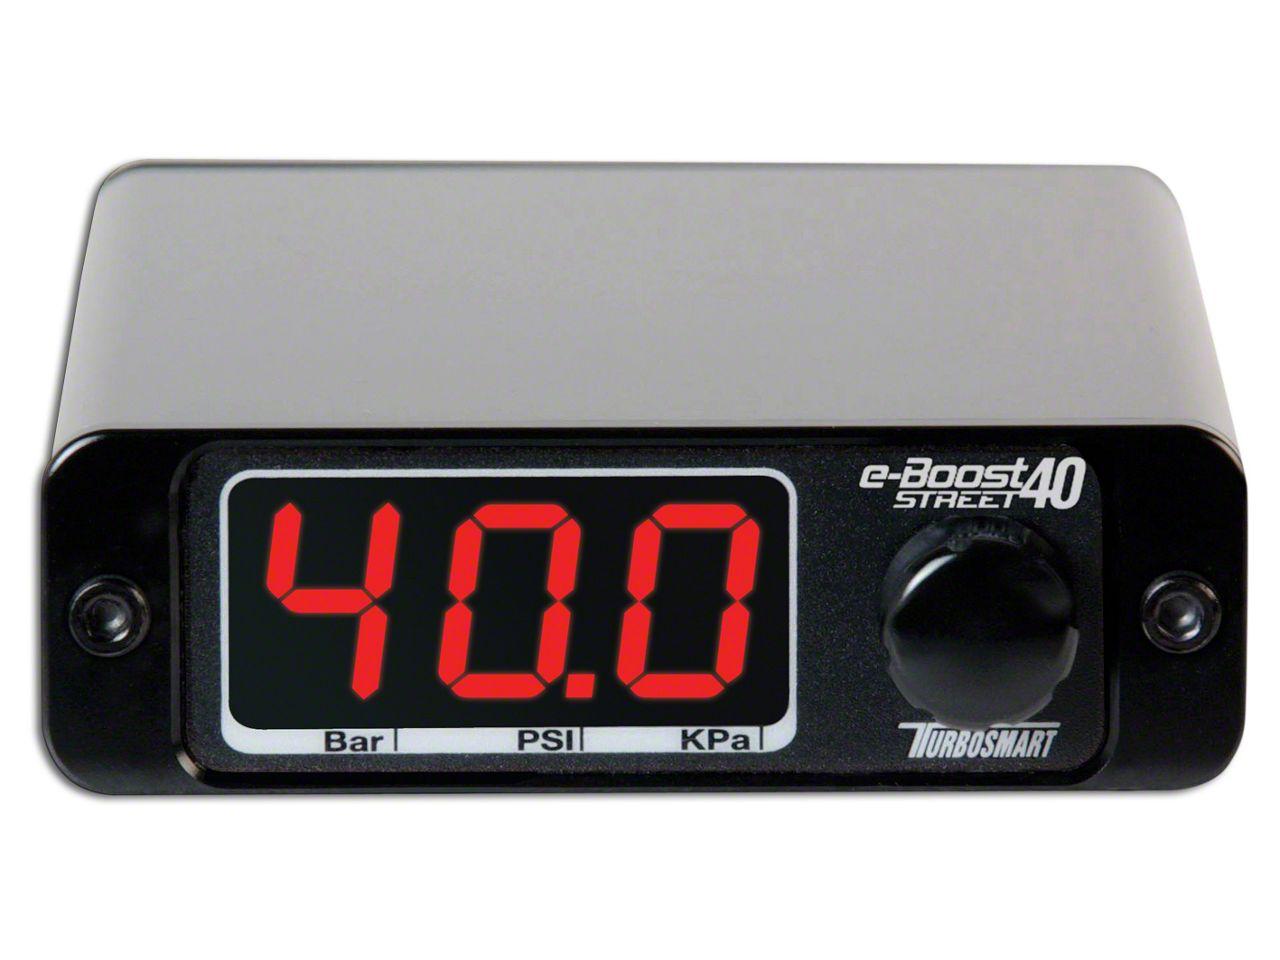 Turbosmart e-Boost Street Boost Controller - 40 PSI (07-18 Sierra 1500)